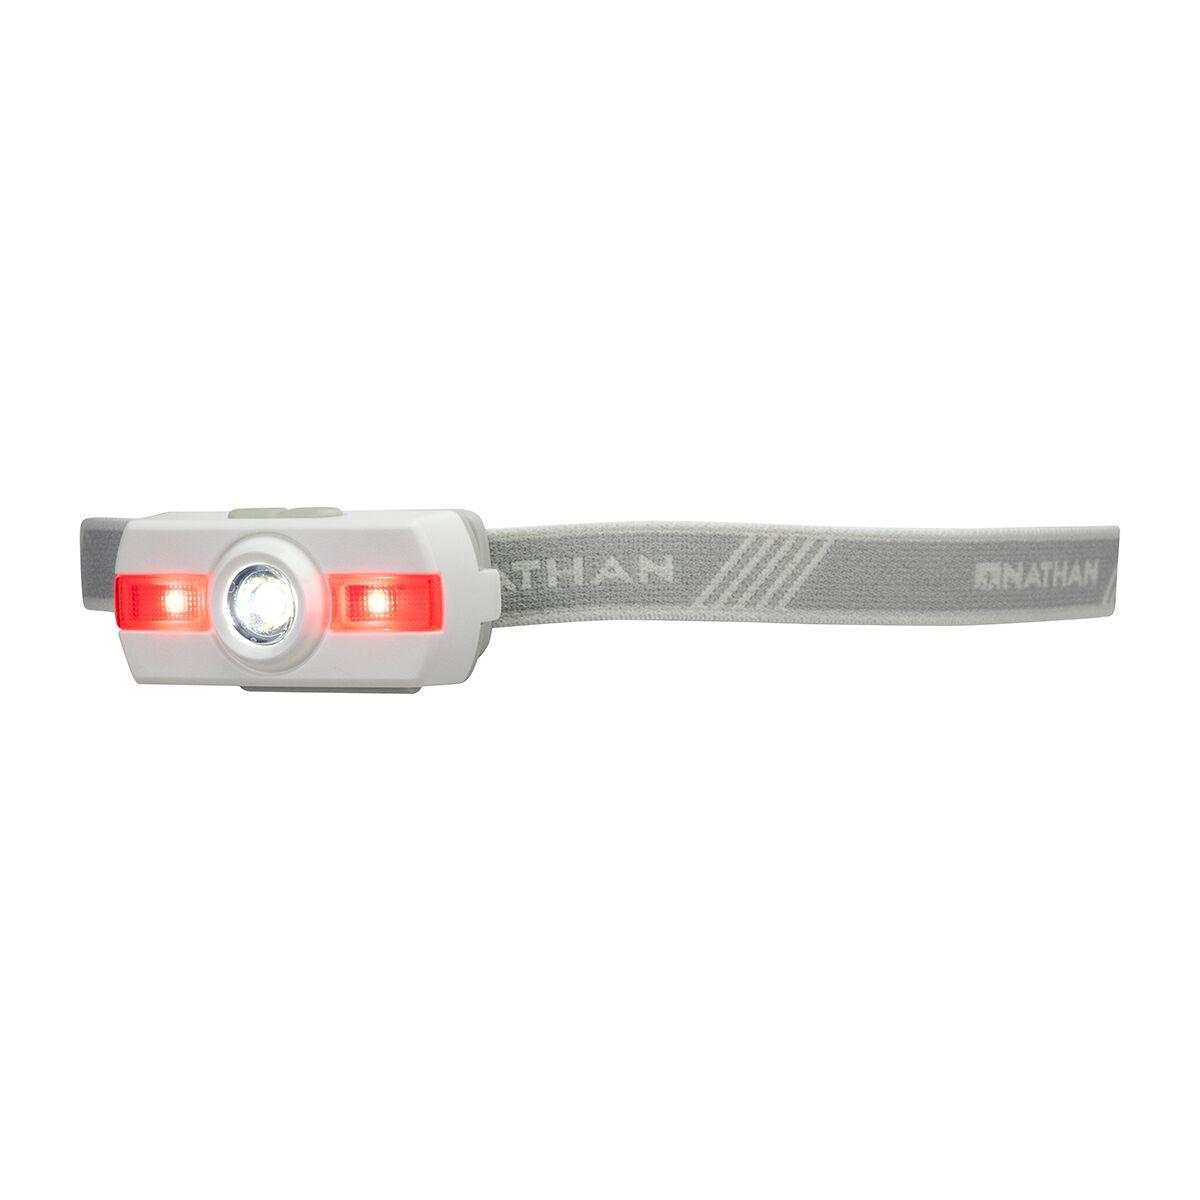 Nathan Sports Neutron Fire Runners' Headlamp Lightweight Long-Lasting 5094 White